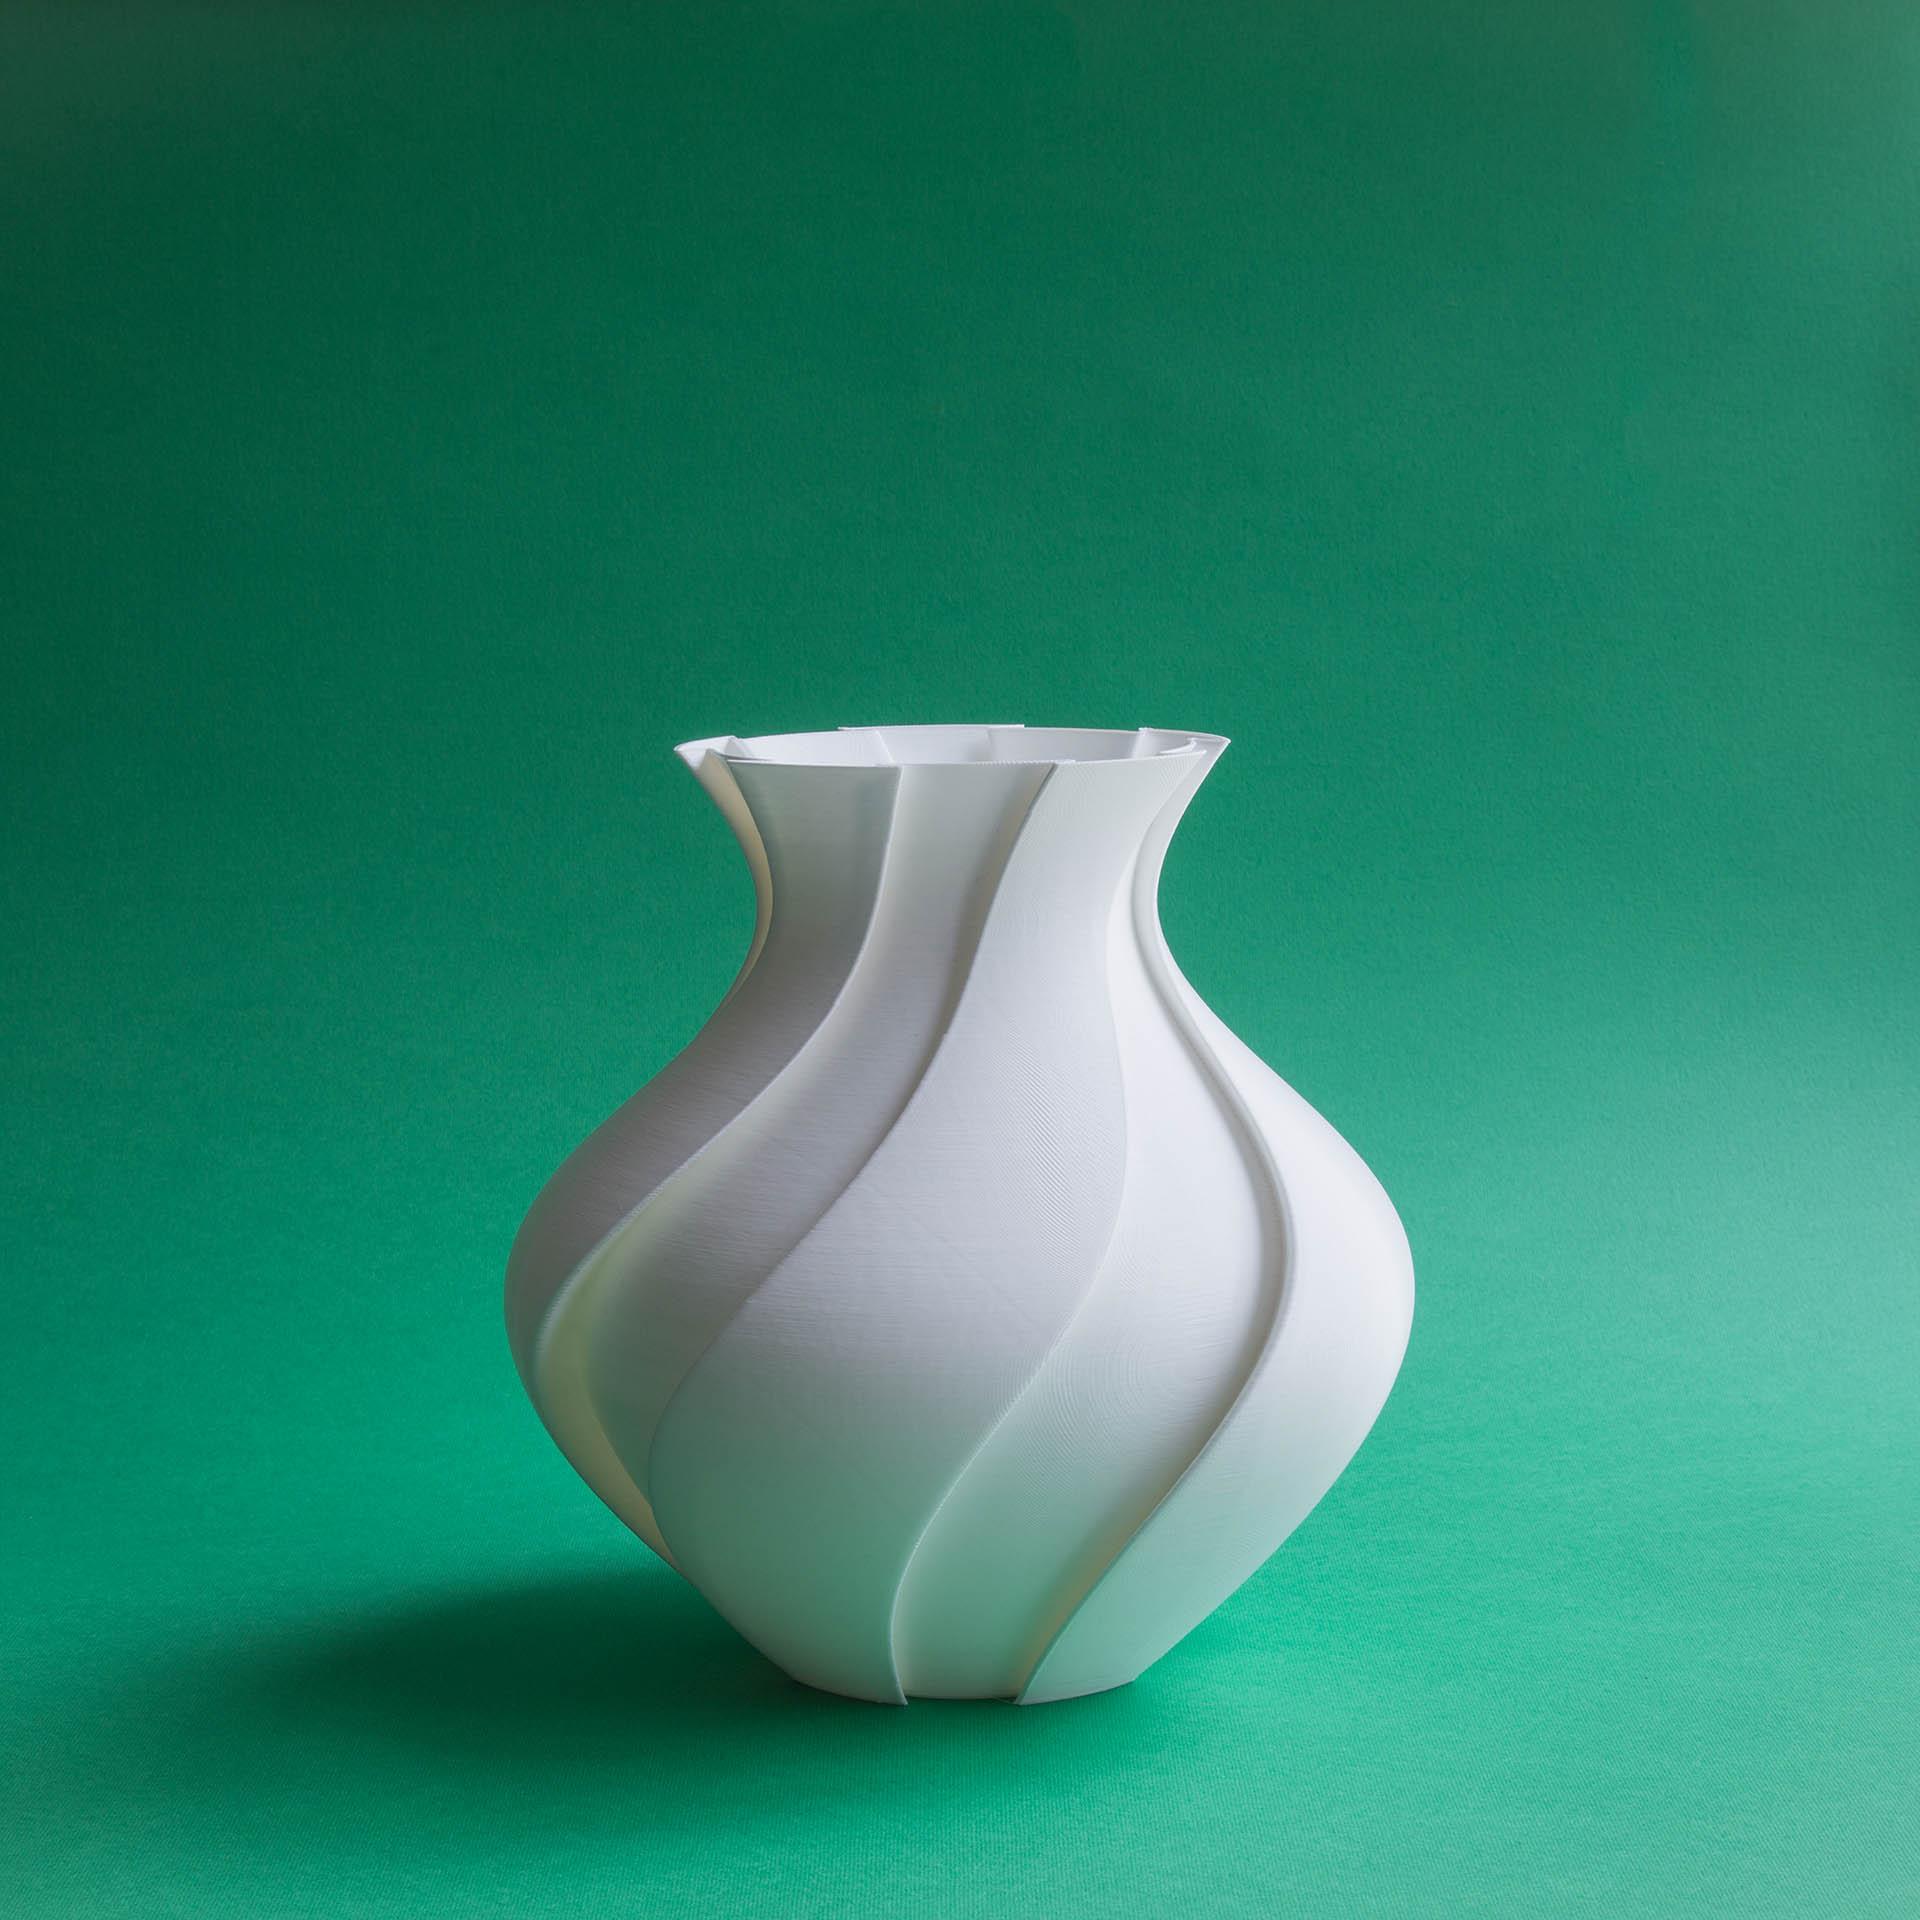 Vásame Kalpis, Adriano Alfaro, vaso stampato 3D